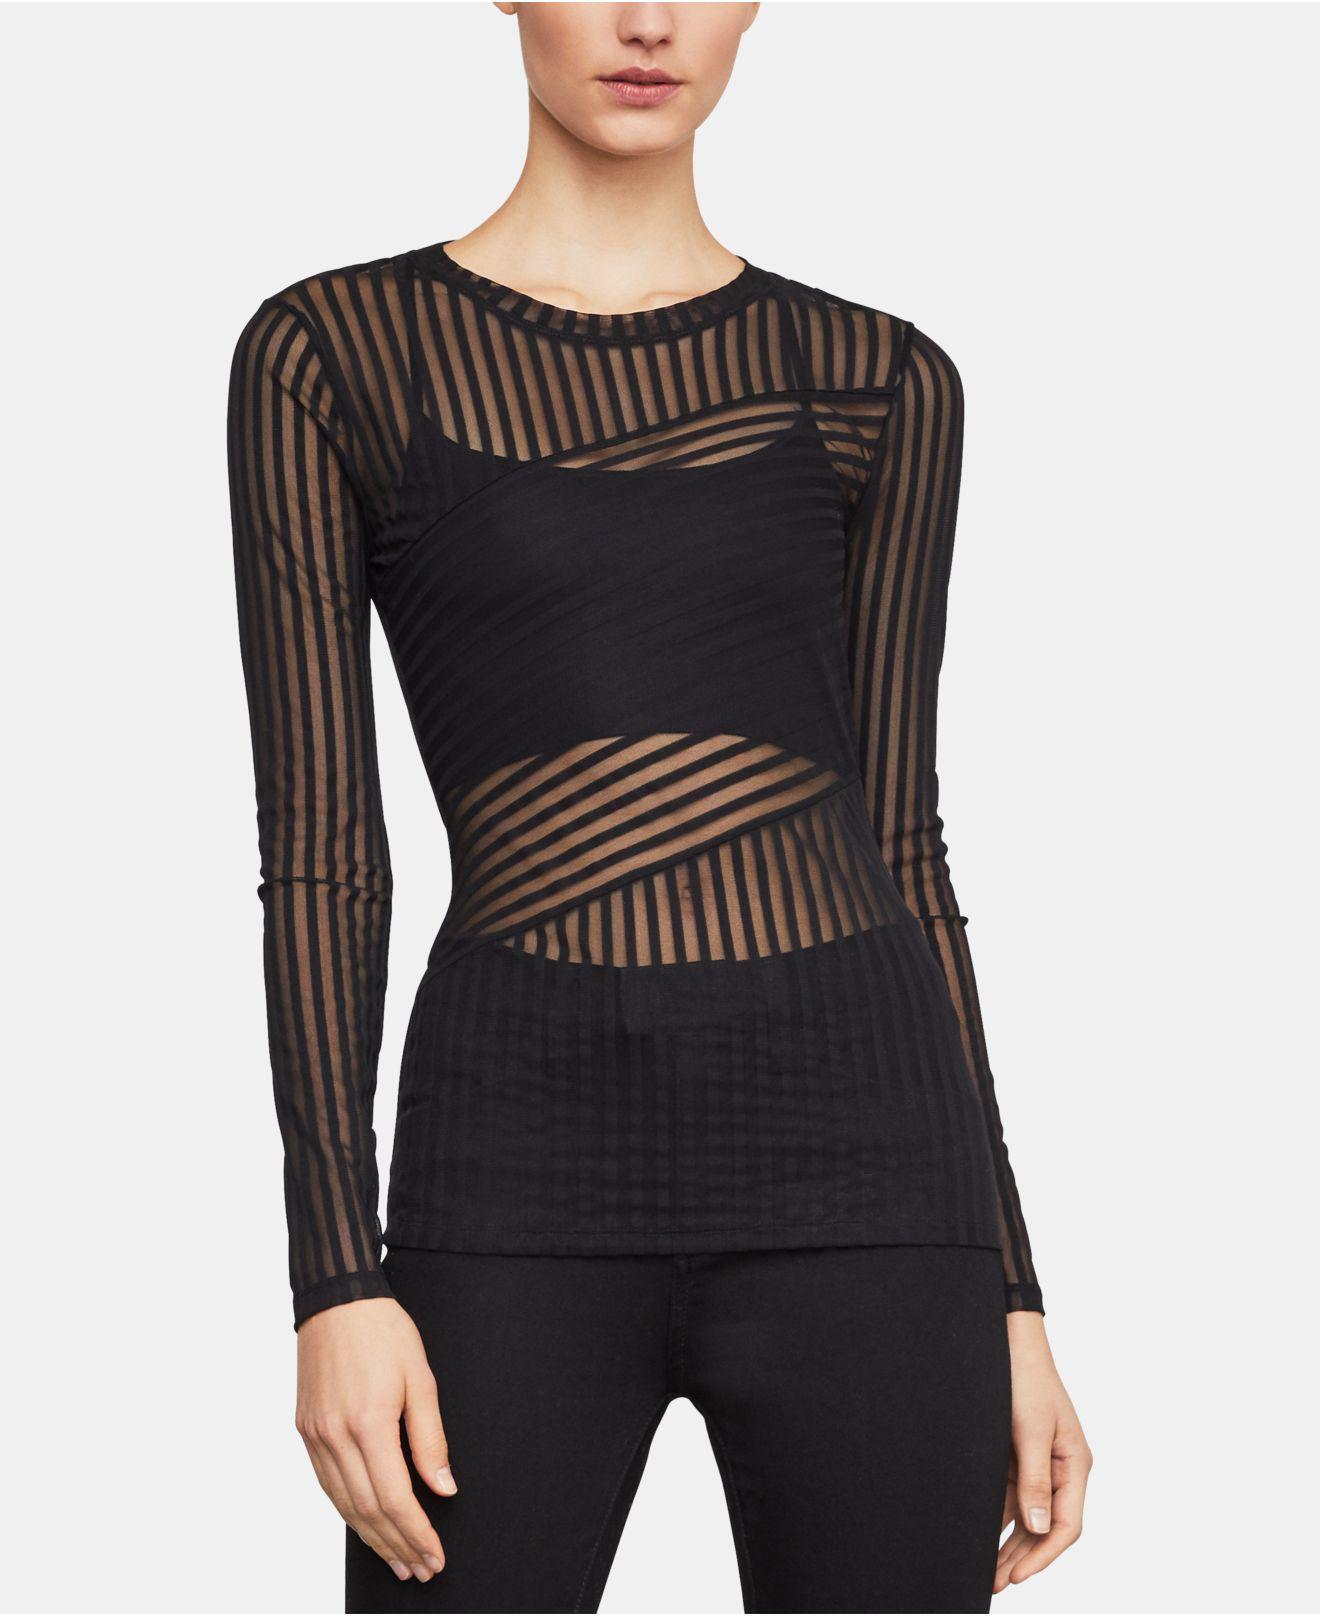 1d7a97987fe92d Lyst - BCBGMAXAZRIA Veira Long-sleeved Striped Top in Black